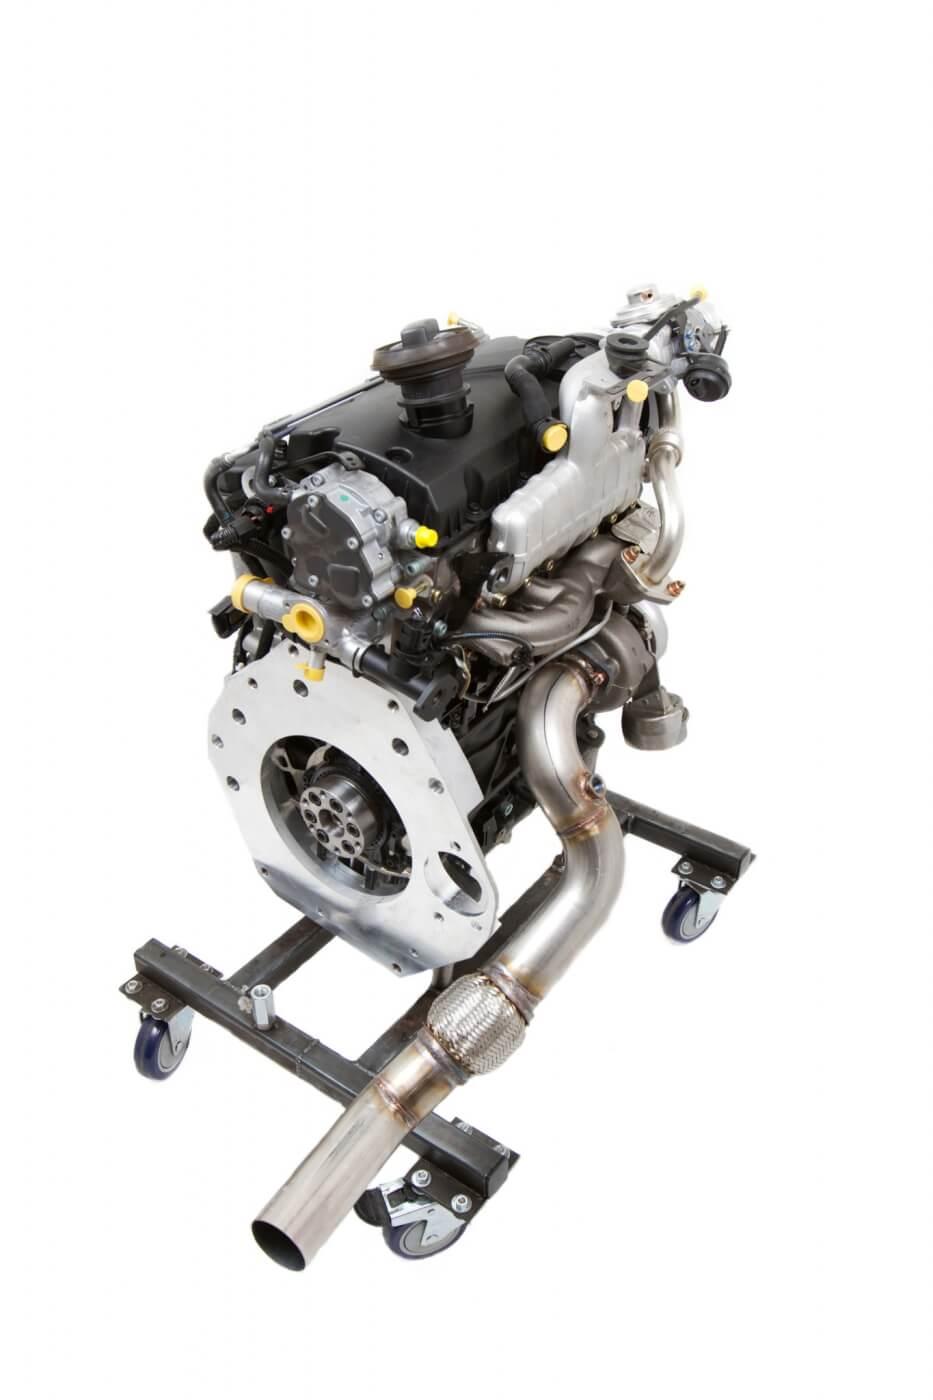 Diesel Torque for TJ Jeeps